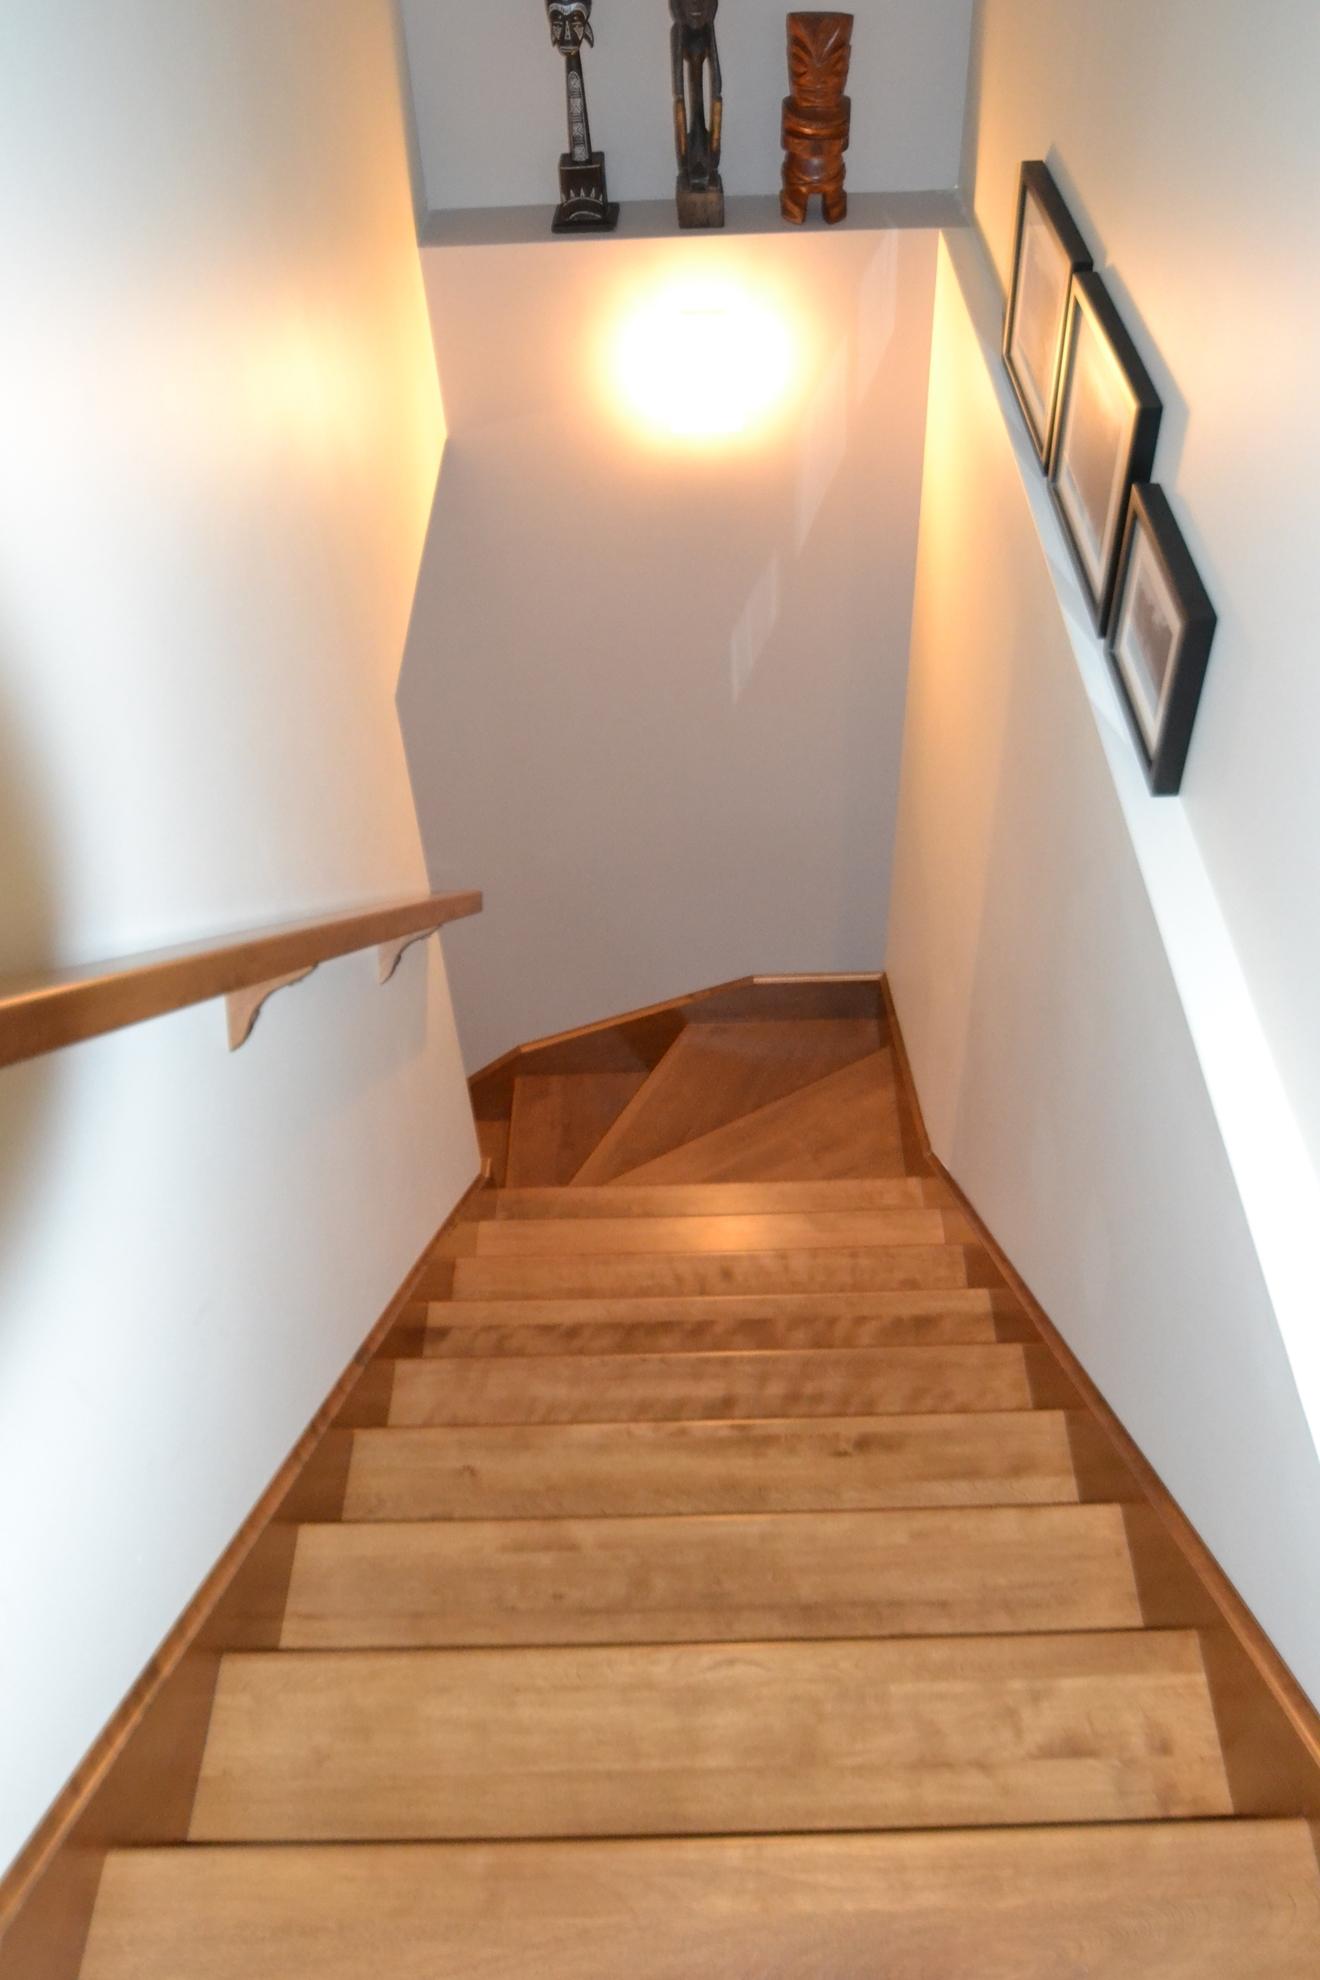 Picture of 01-Escalier main-courante